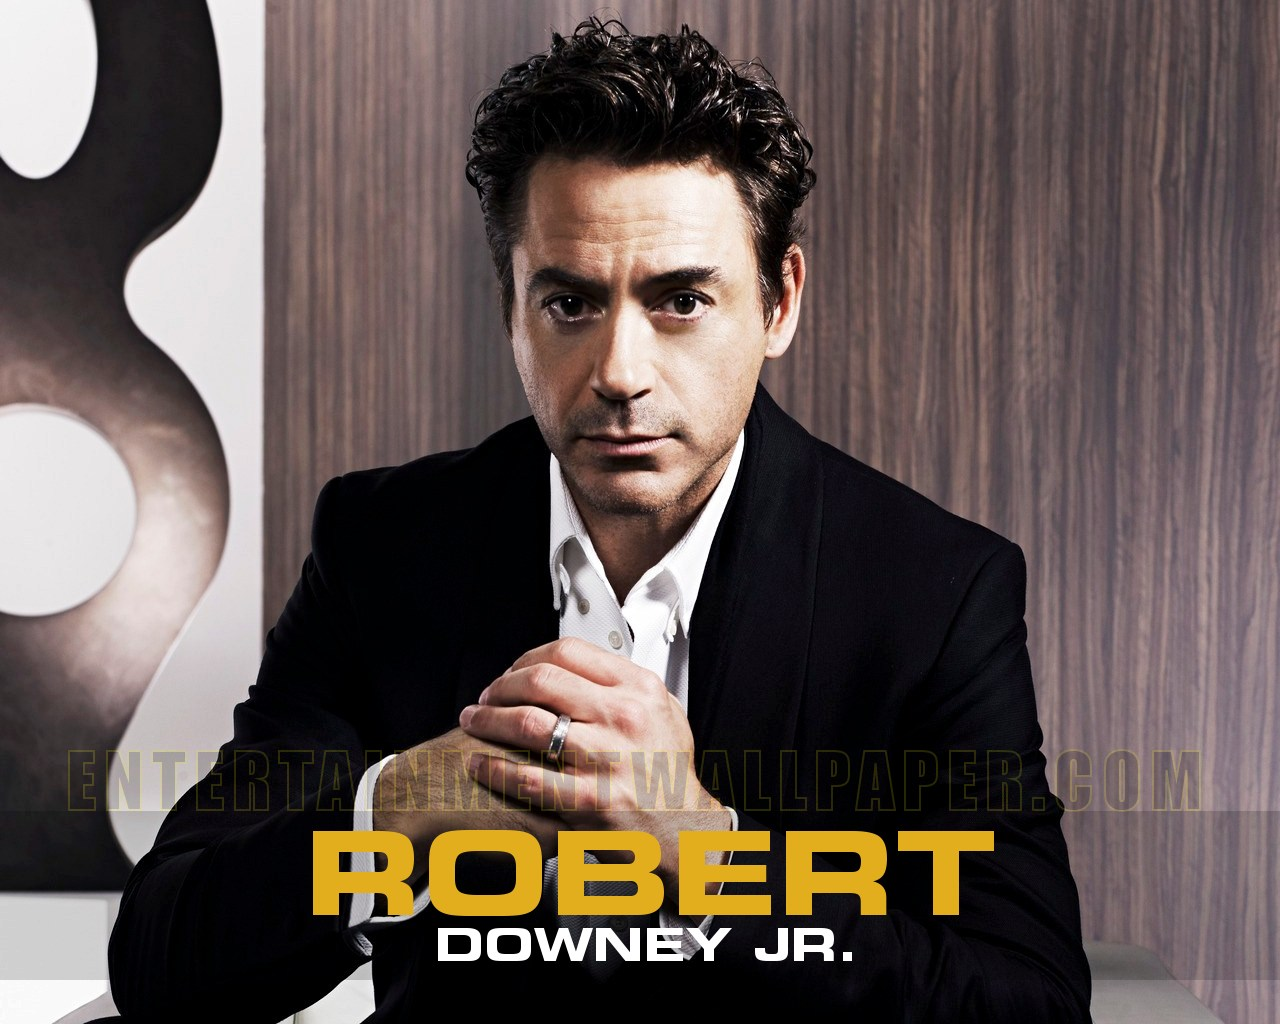 http://3.bp.blogspot.com/-o8xRO8R9Lpc/T3q4bK9GB_I/AAAAAAAABxE/0yqXOYwegkg/s1600/Robert-Downey-Jr-05.jpg